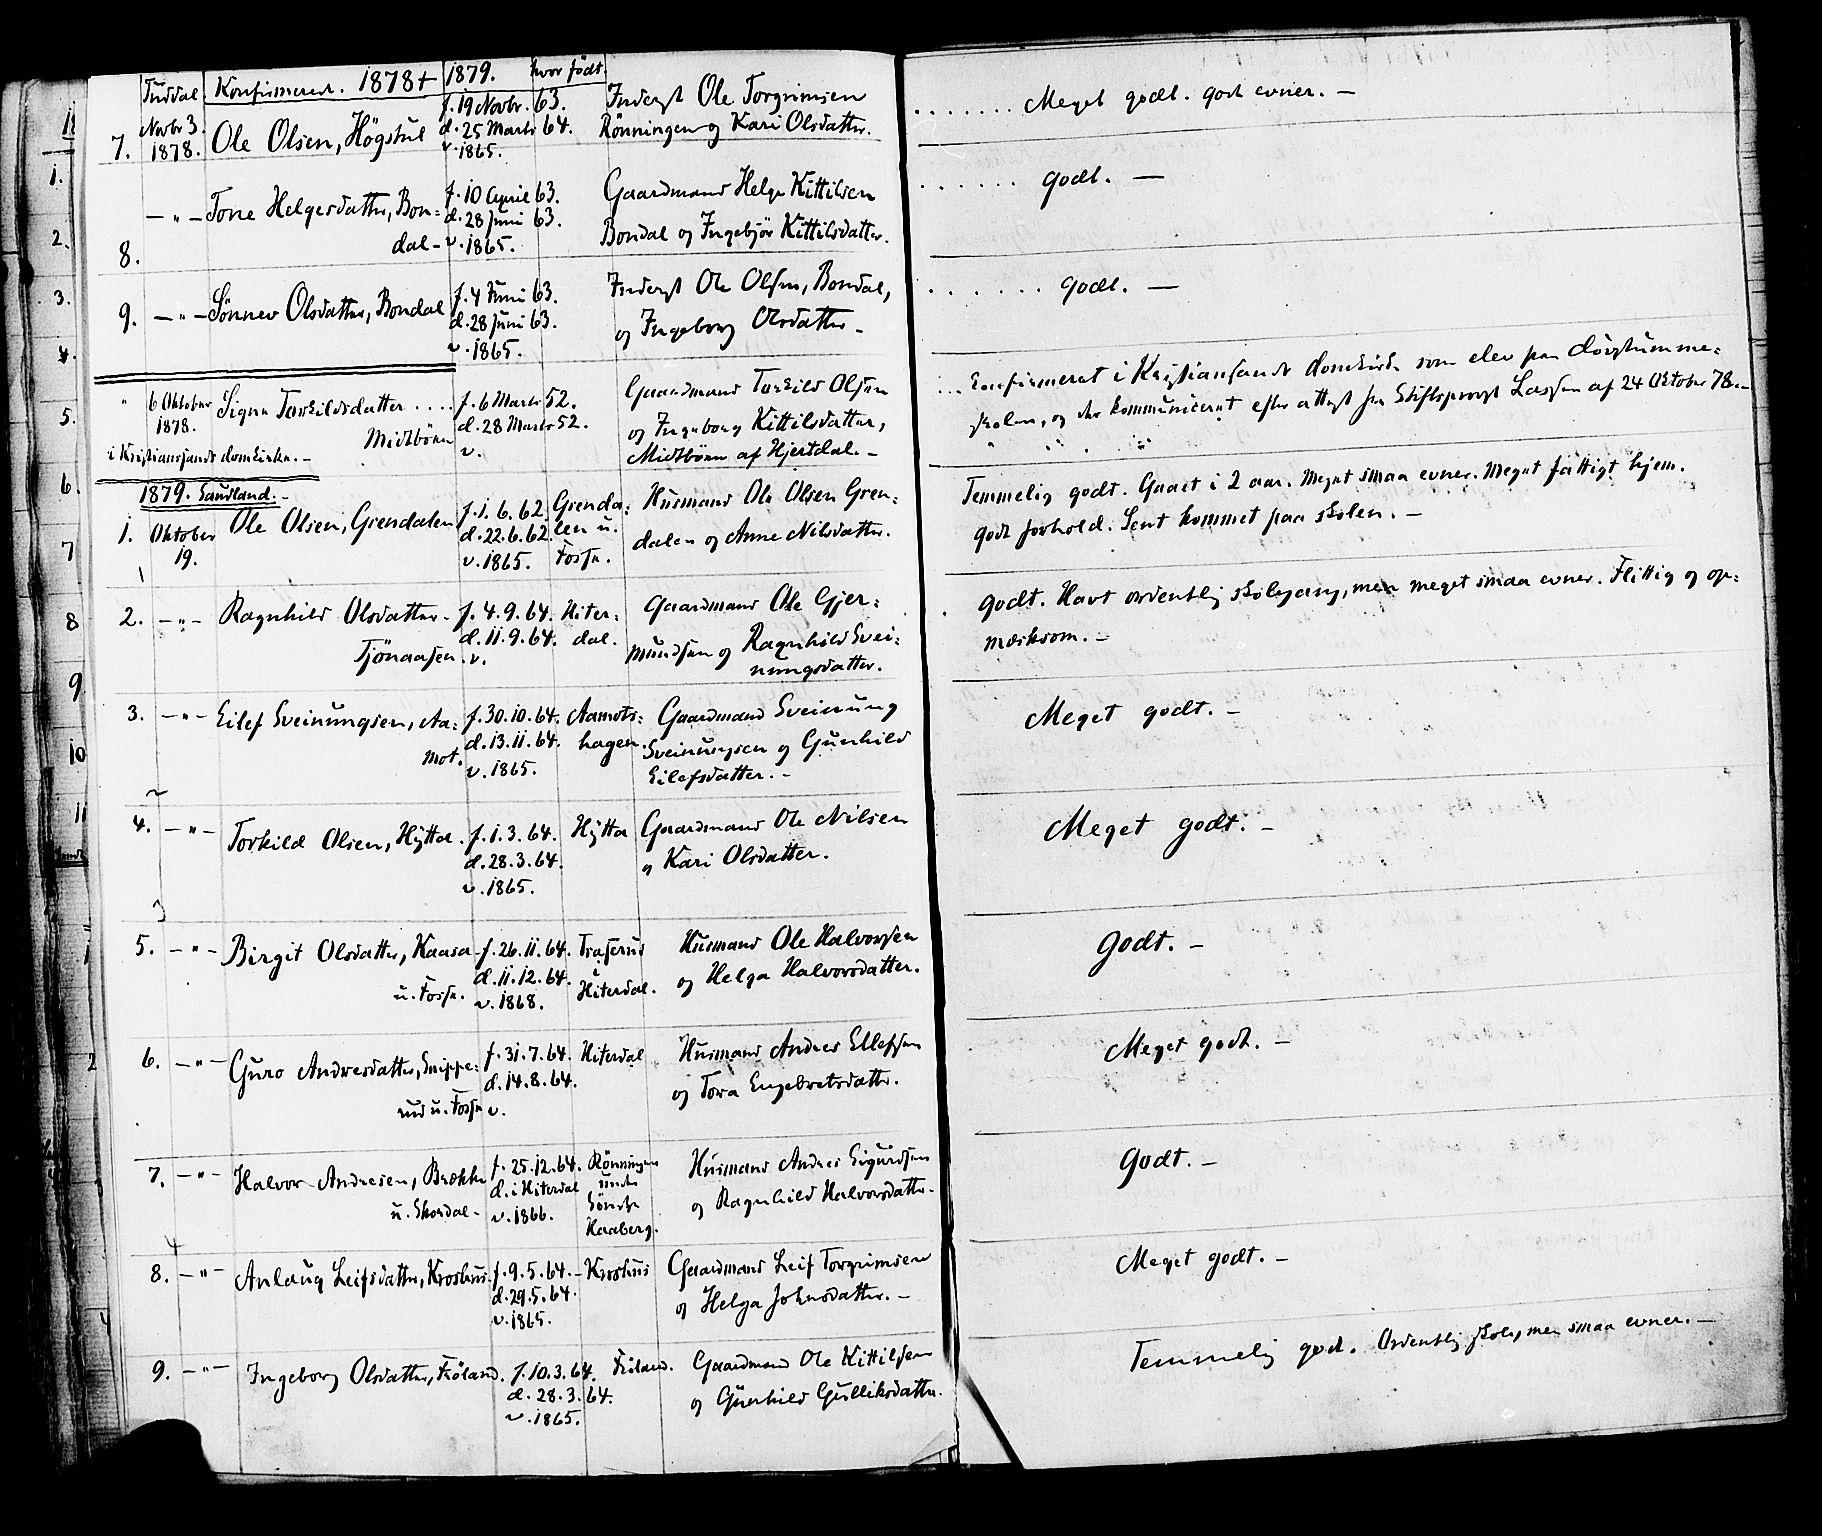 SAKO, Hjartdal kirkebøker, F/Fa/L0009: Ministerialbok nr. I 9, 1860-1879